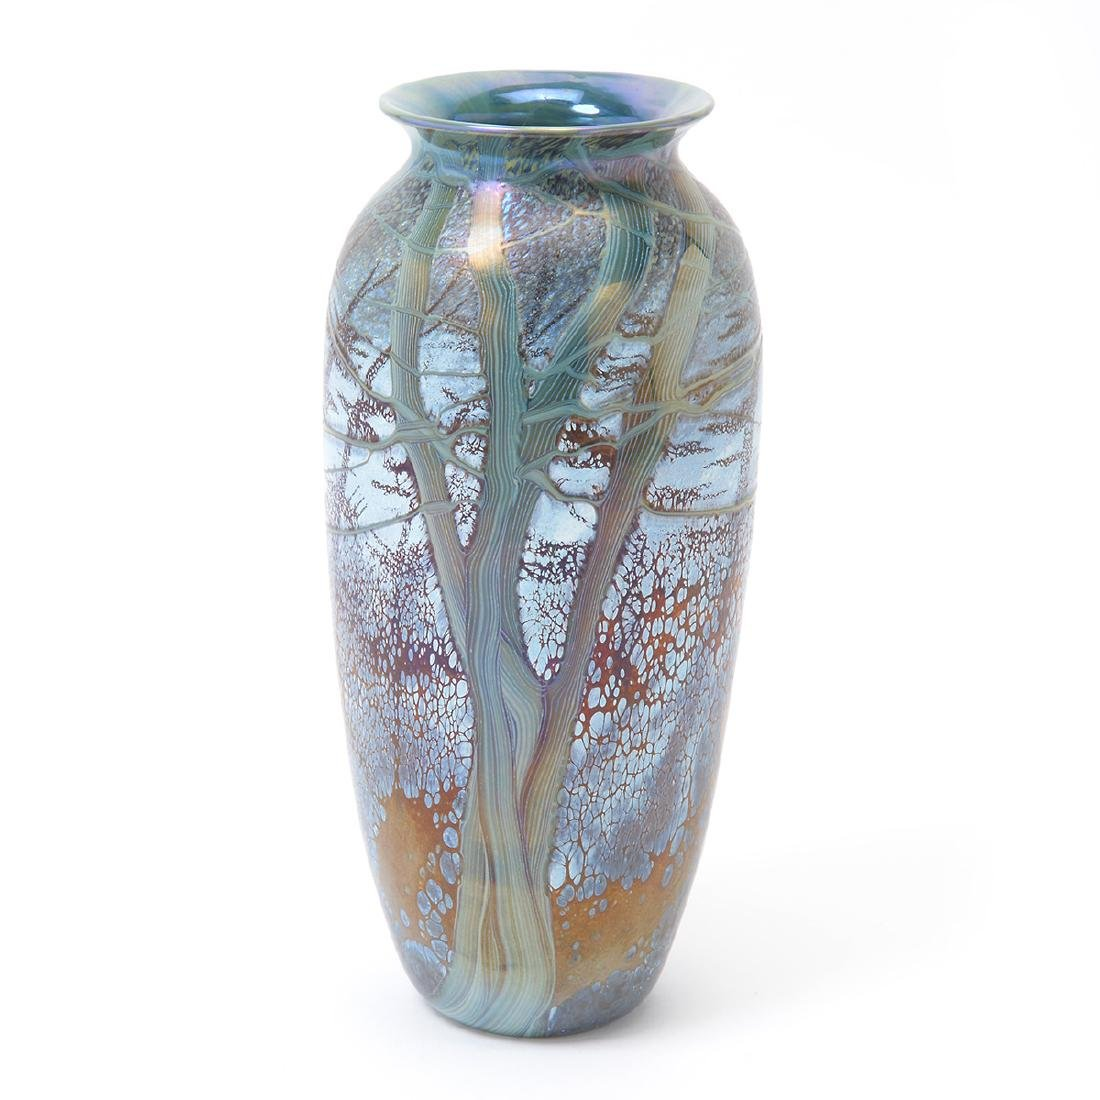 Two Richard Satava Art Glass Vases - Interior Lily and - 6